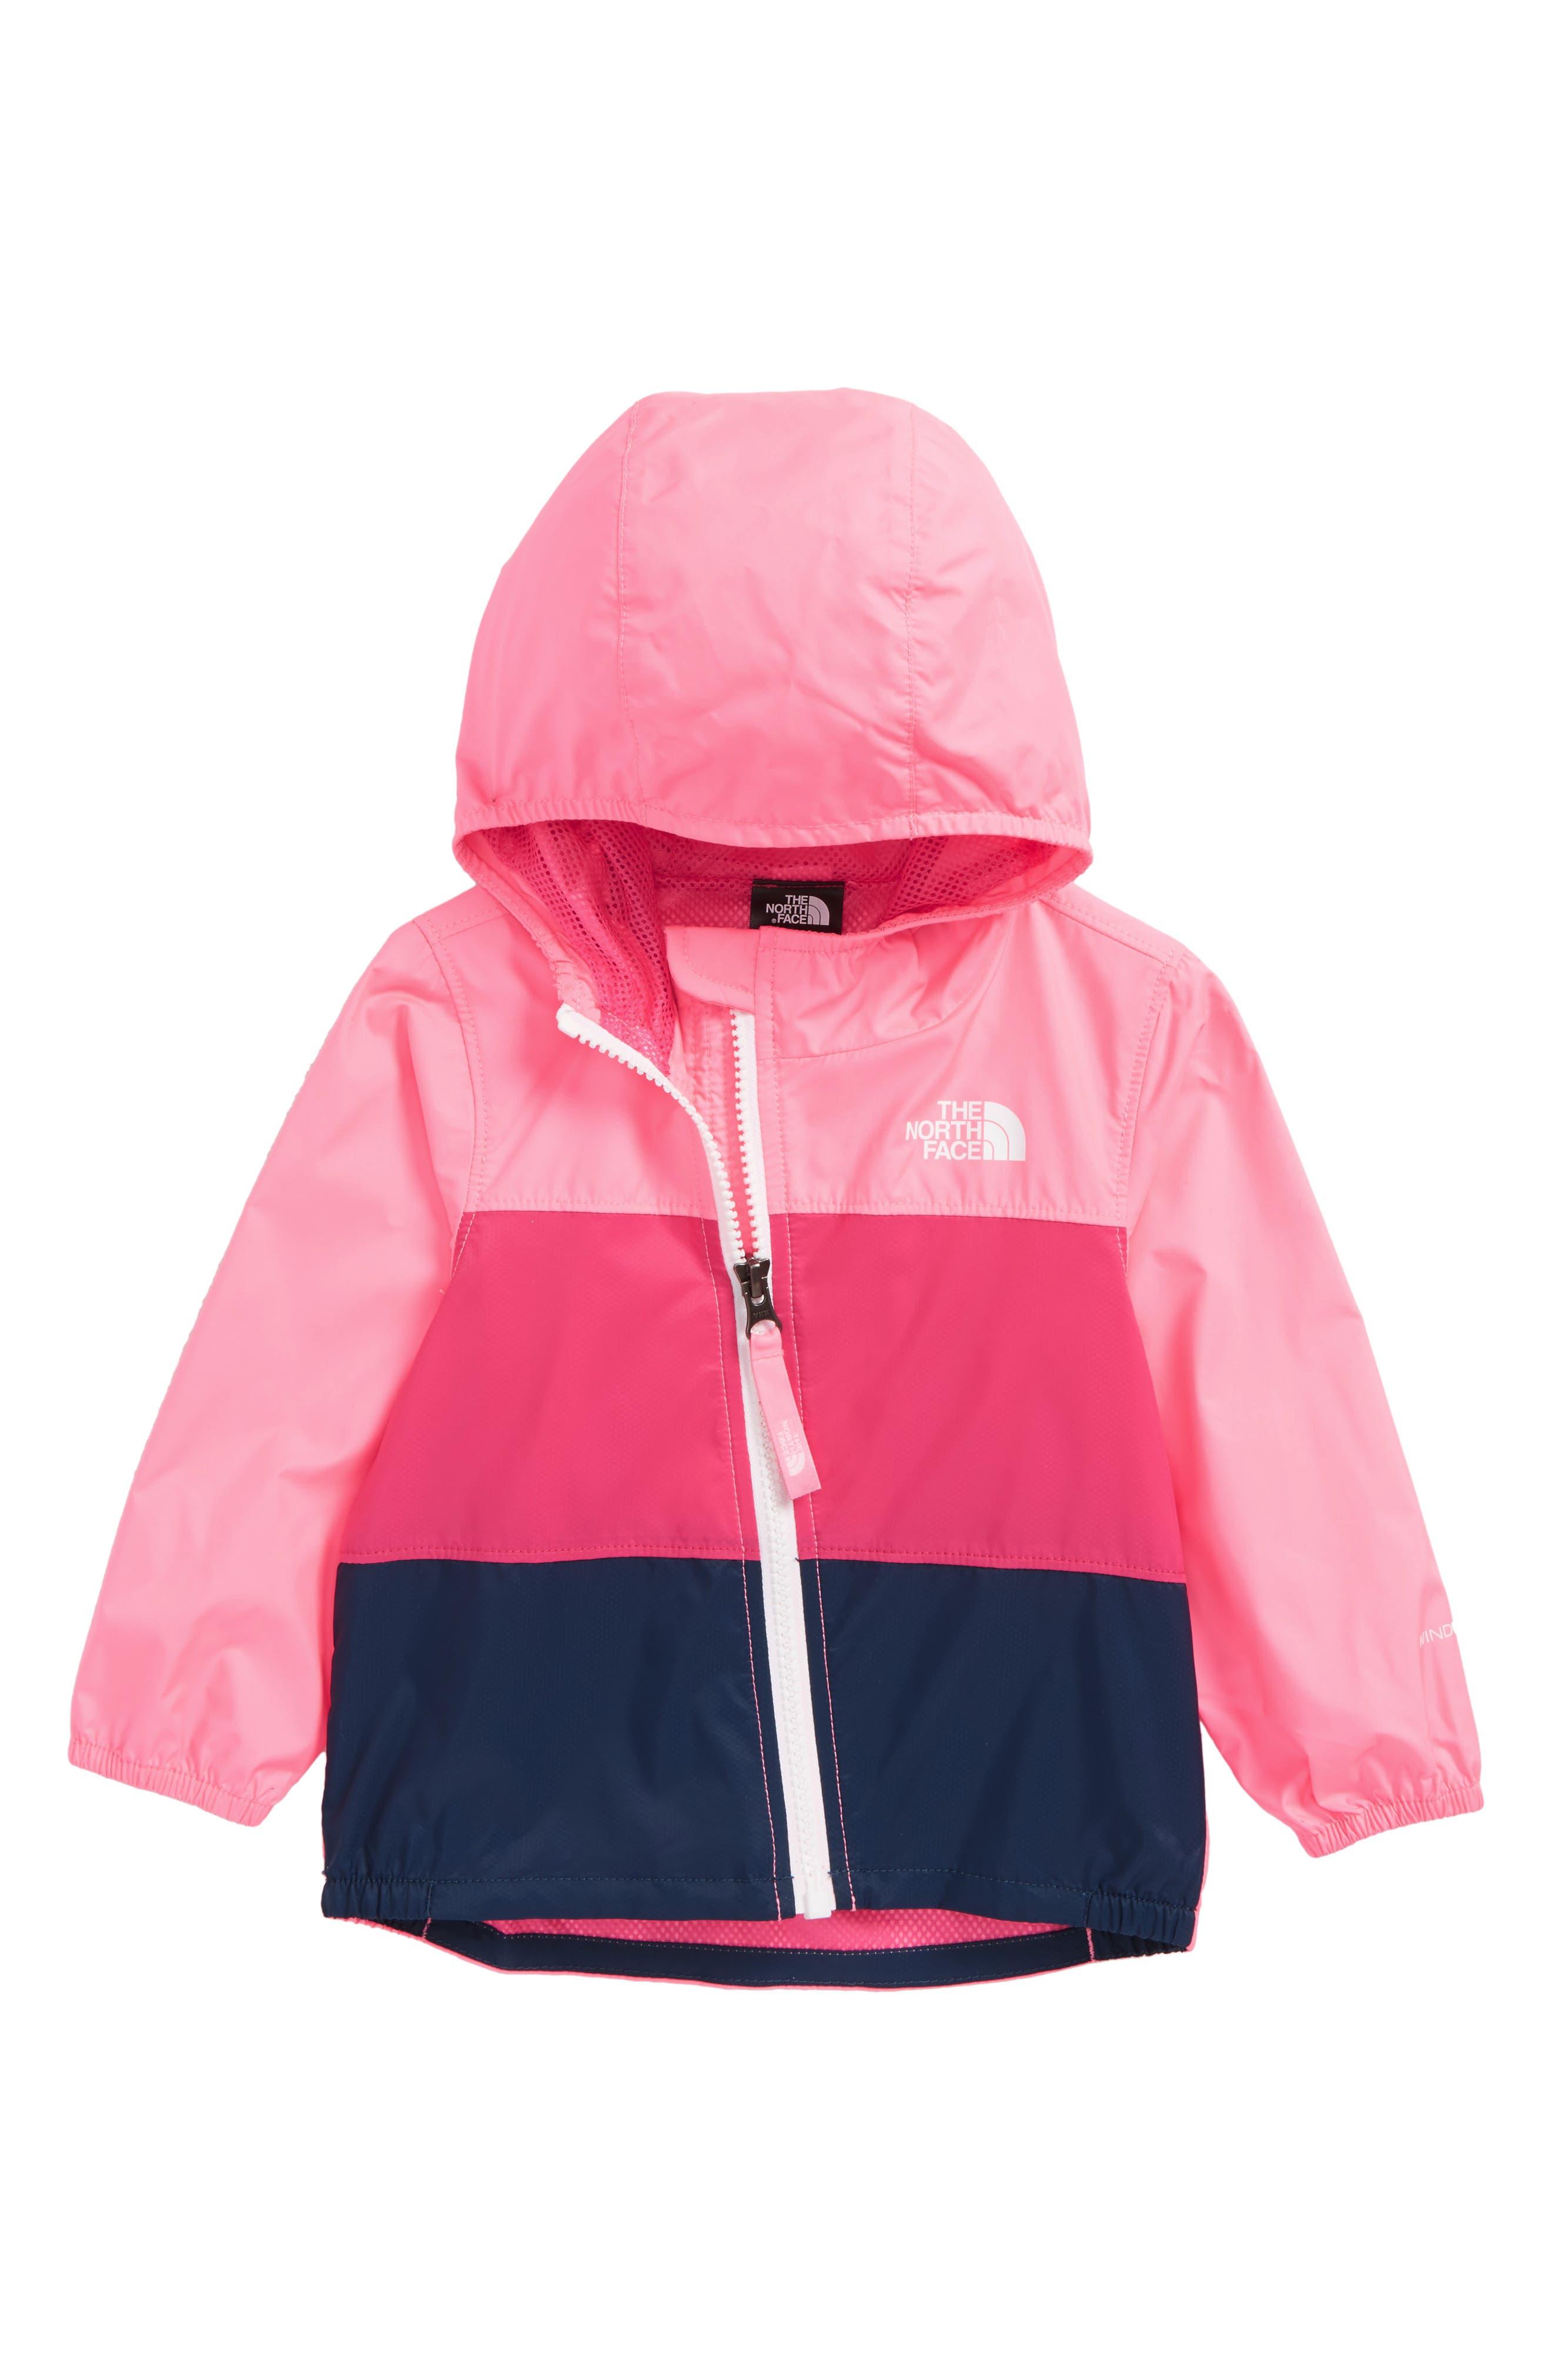 Flurry Hooded Windbreaker,                             Main thumbnail 1, color,                             Gem Pink